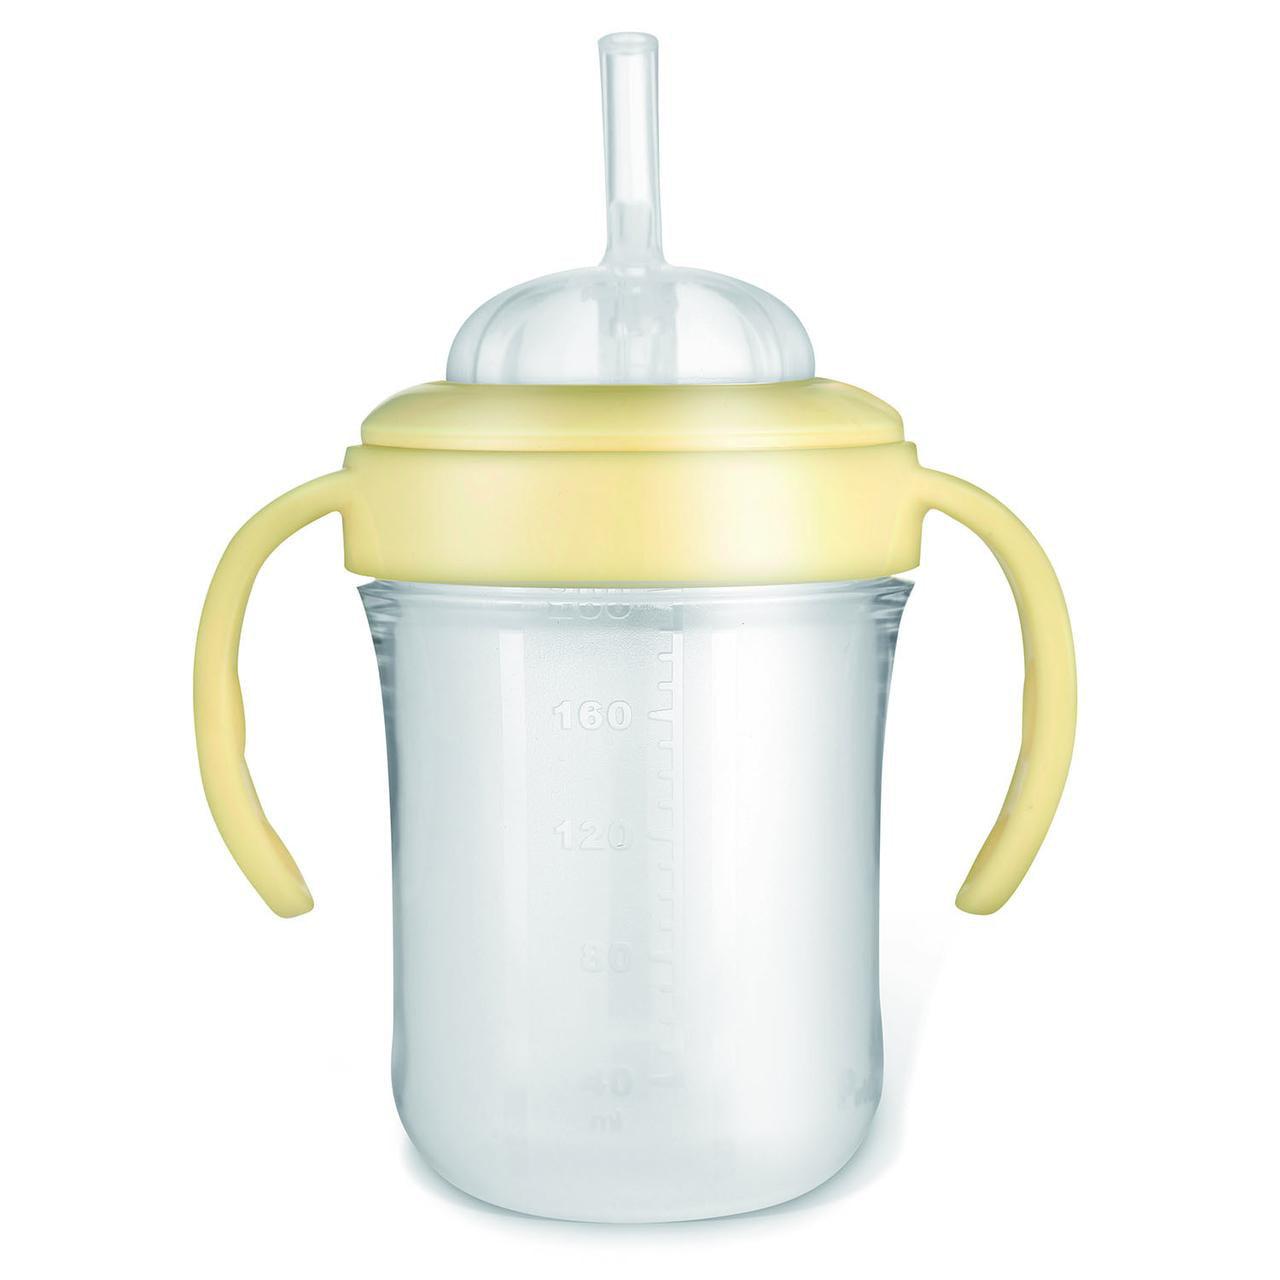 Putti Atti Sippy Cup 6.8fl oz Straw (8 month+) by Putti Atti